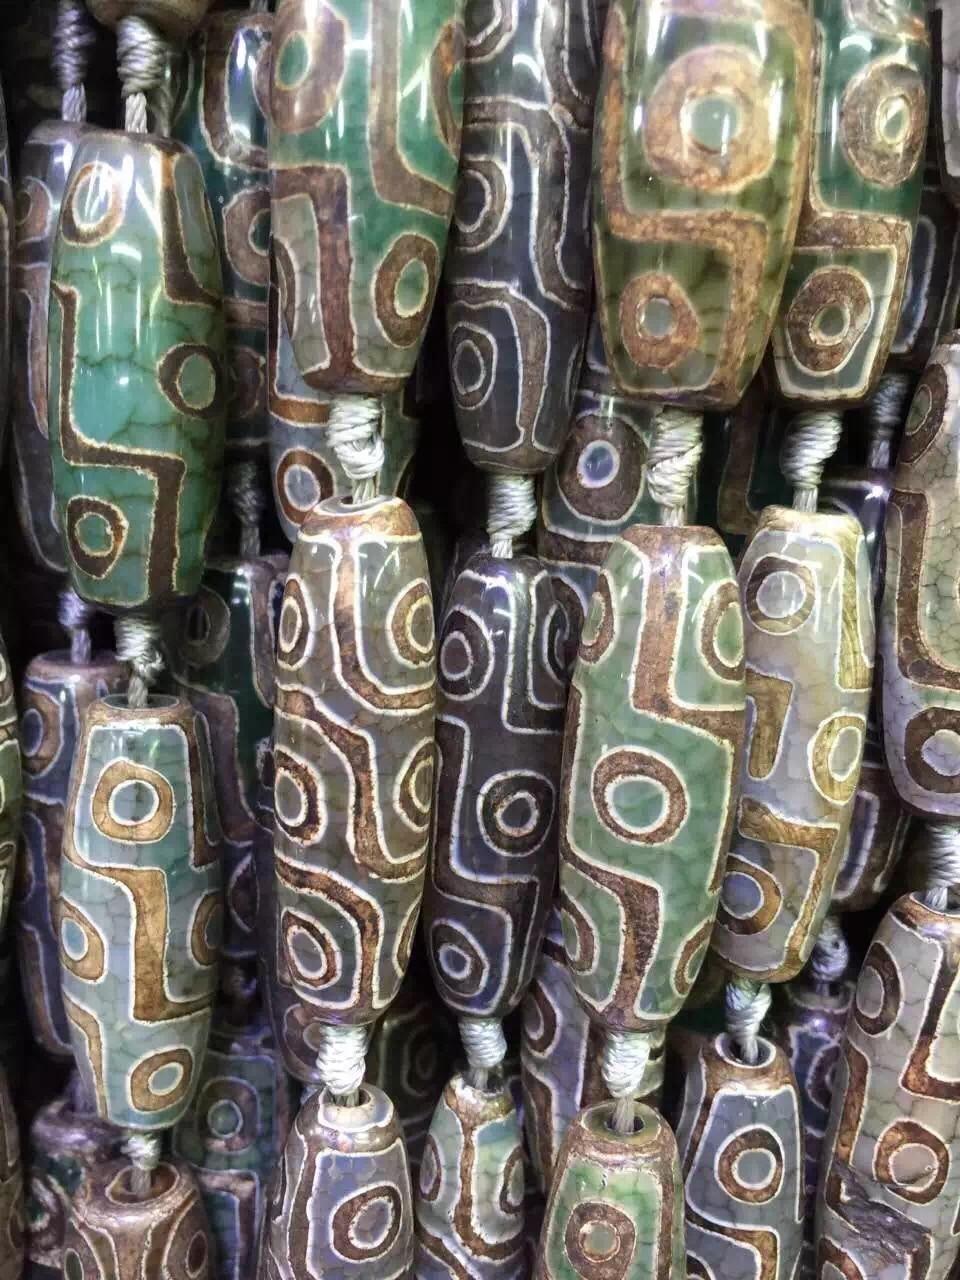 2 Strands Lot 9 Mata Alami Doa Mala Tibet Mystical Batu Dzi Heat Shrink Tube 03 Cm Solatip Bakar Selang Selongsong Beads Pesona Beras Gems Matte Turtleback Drum Bead